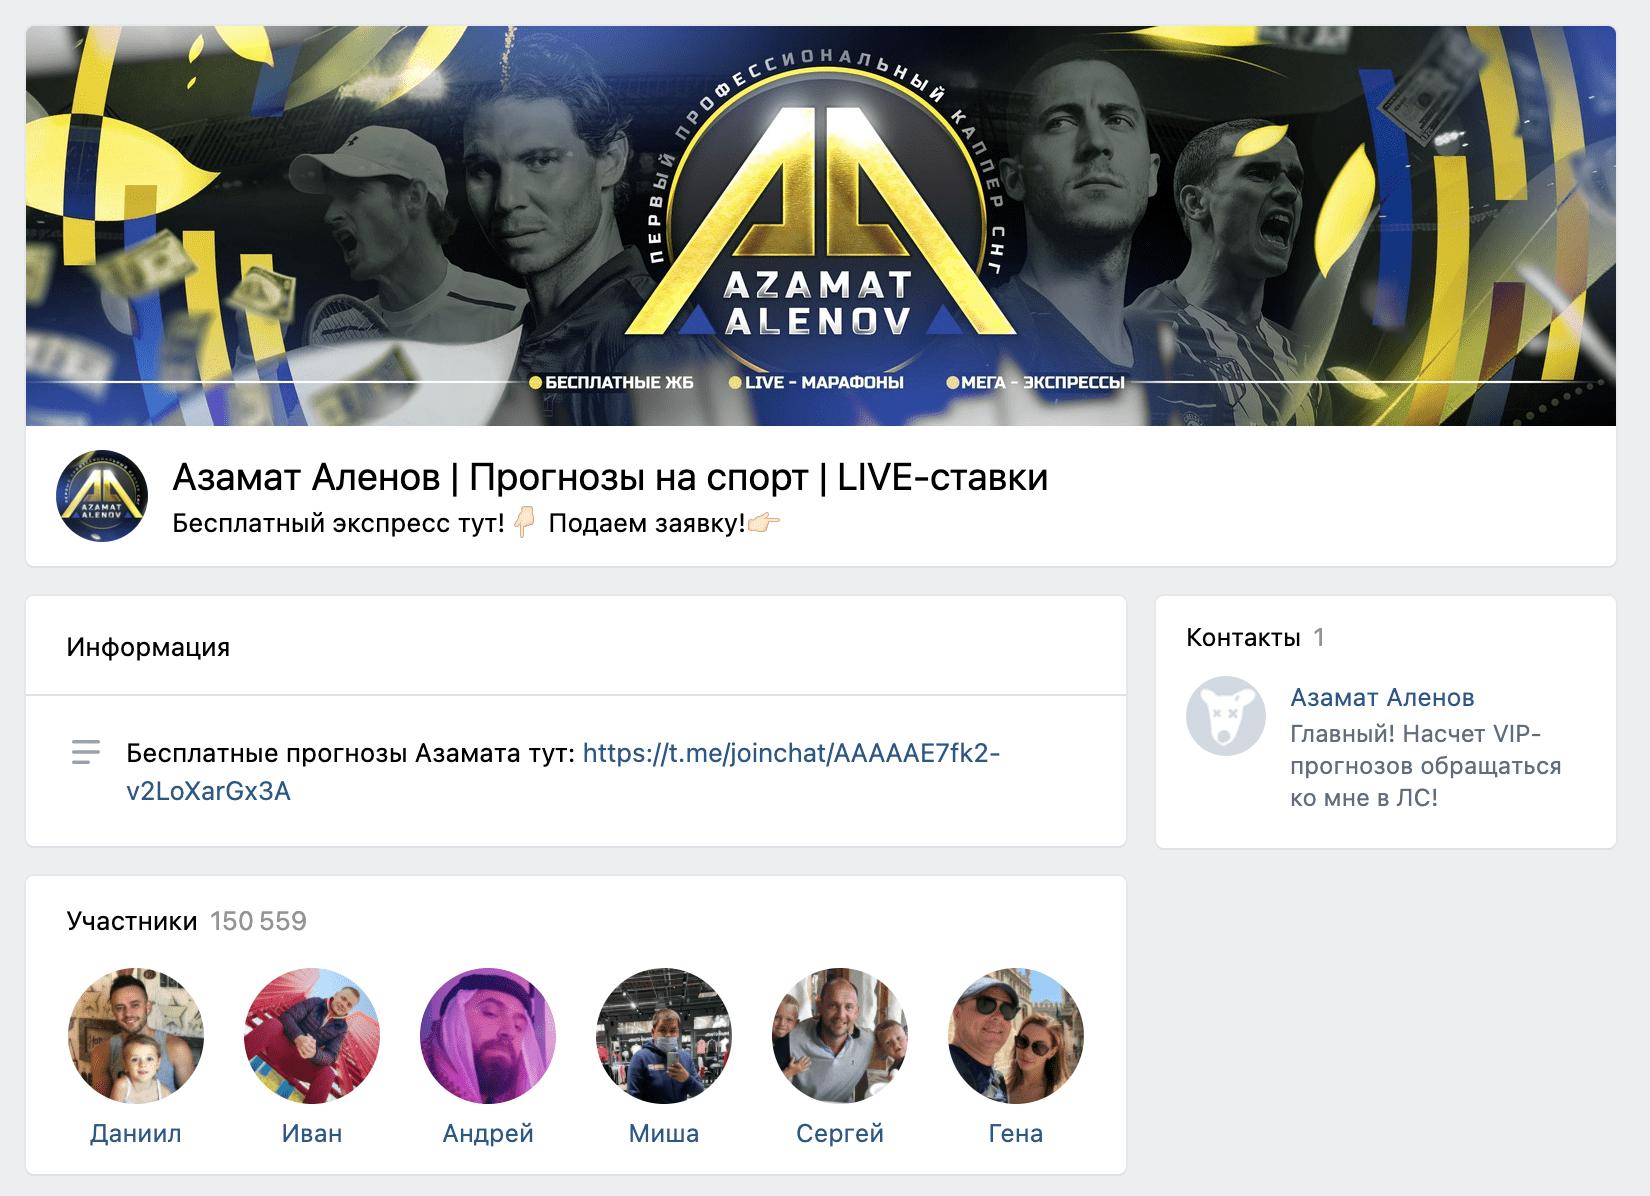 Группа ВК Азамата Аленова(Azamat Alenov)